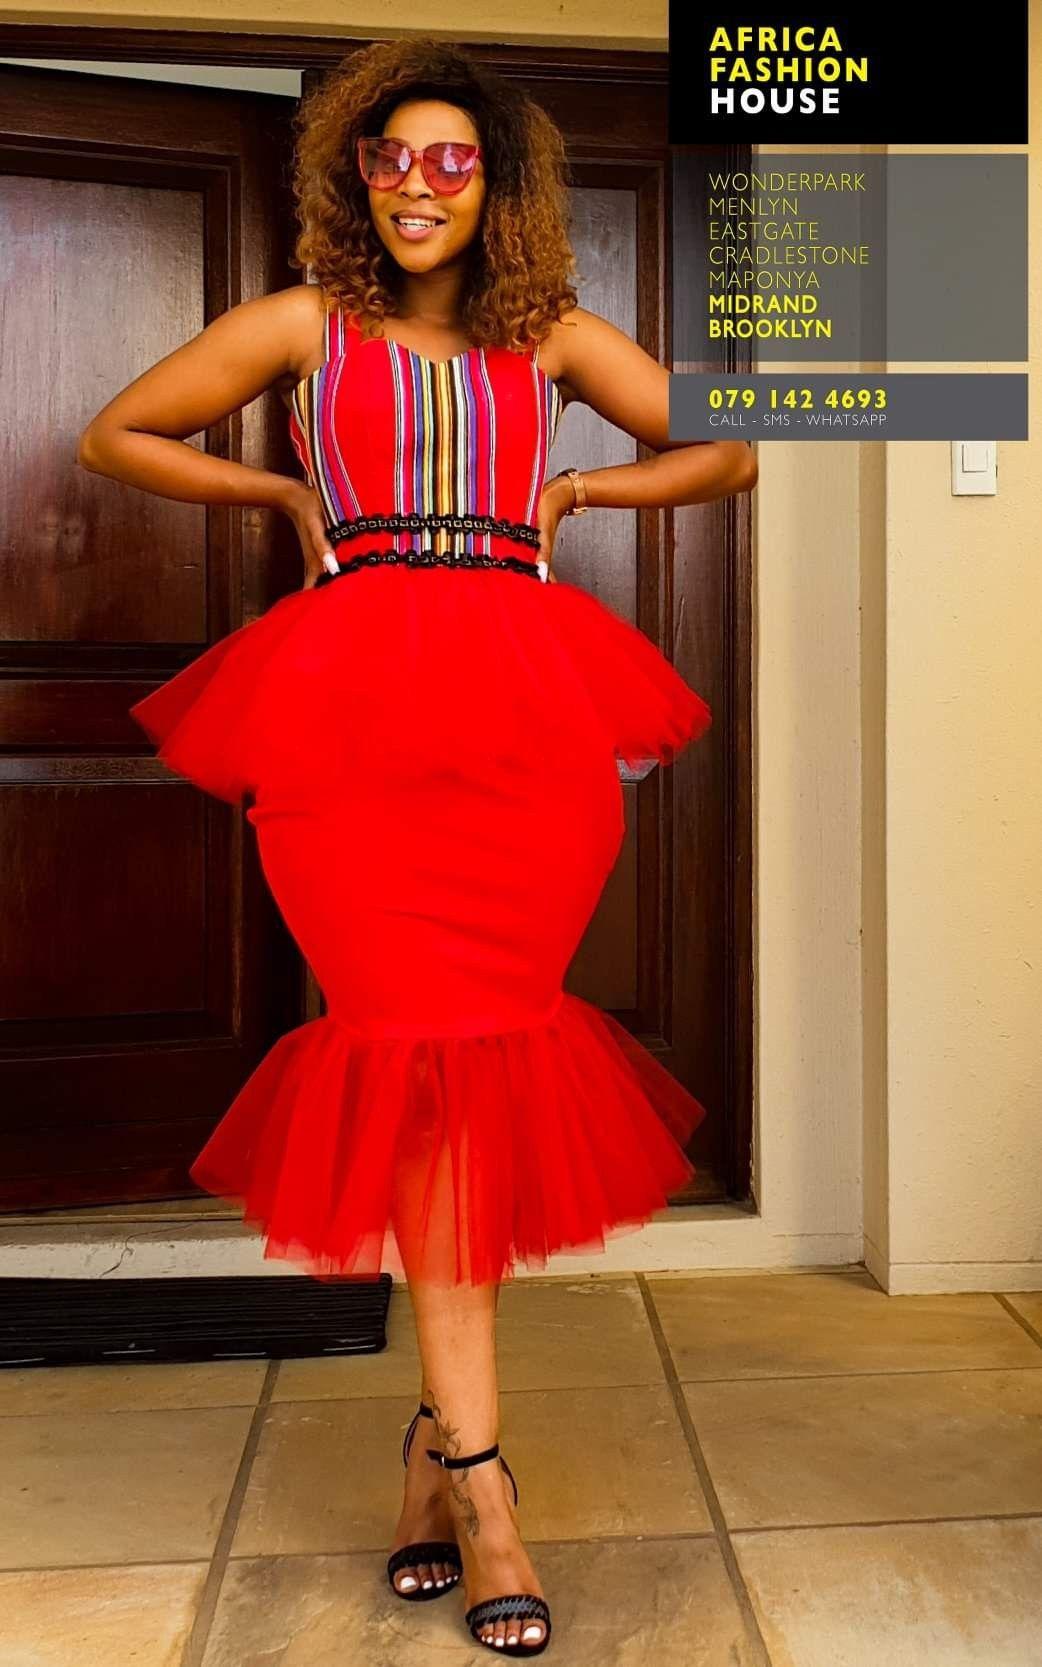 Pin By Kulani Baloyi On Venda Traditional Wedding Ideas African Attire Dresses Venda Traditional Attire African Attire [ 1667 x 1042 Pixel ]